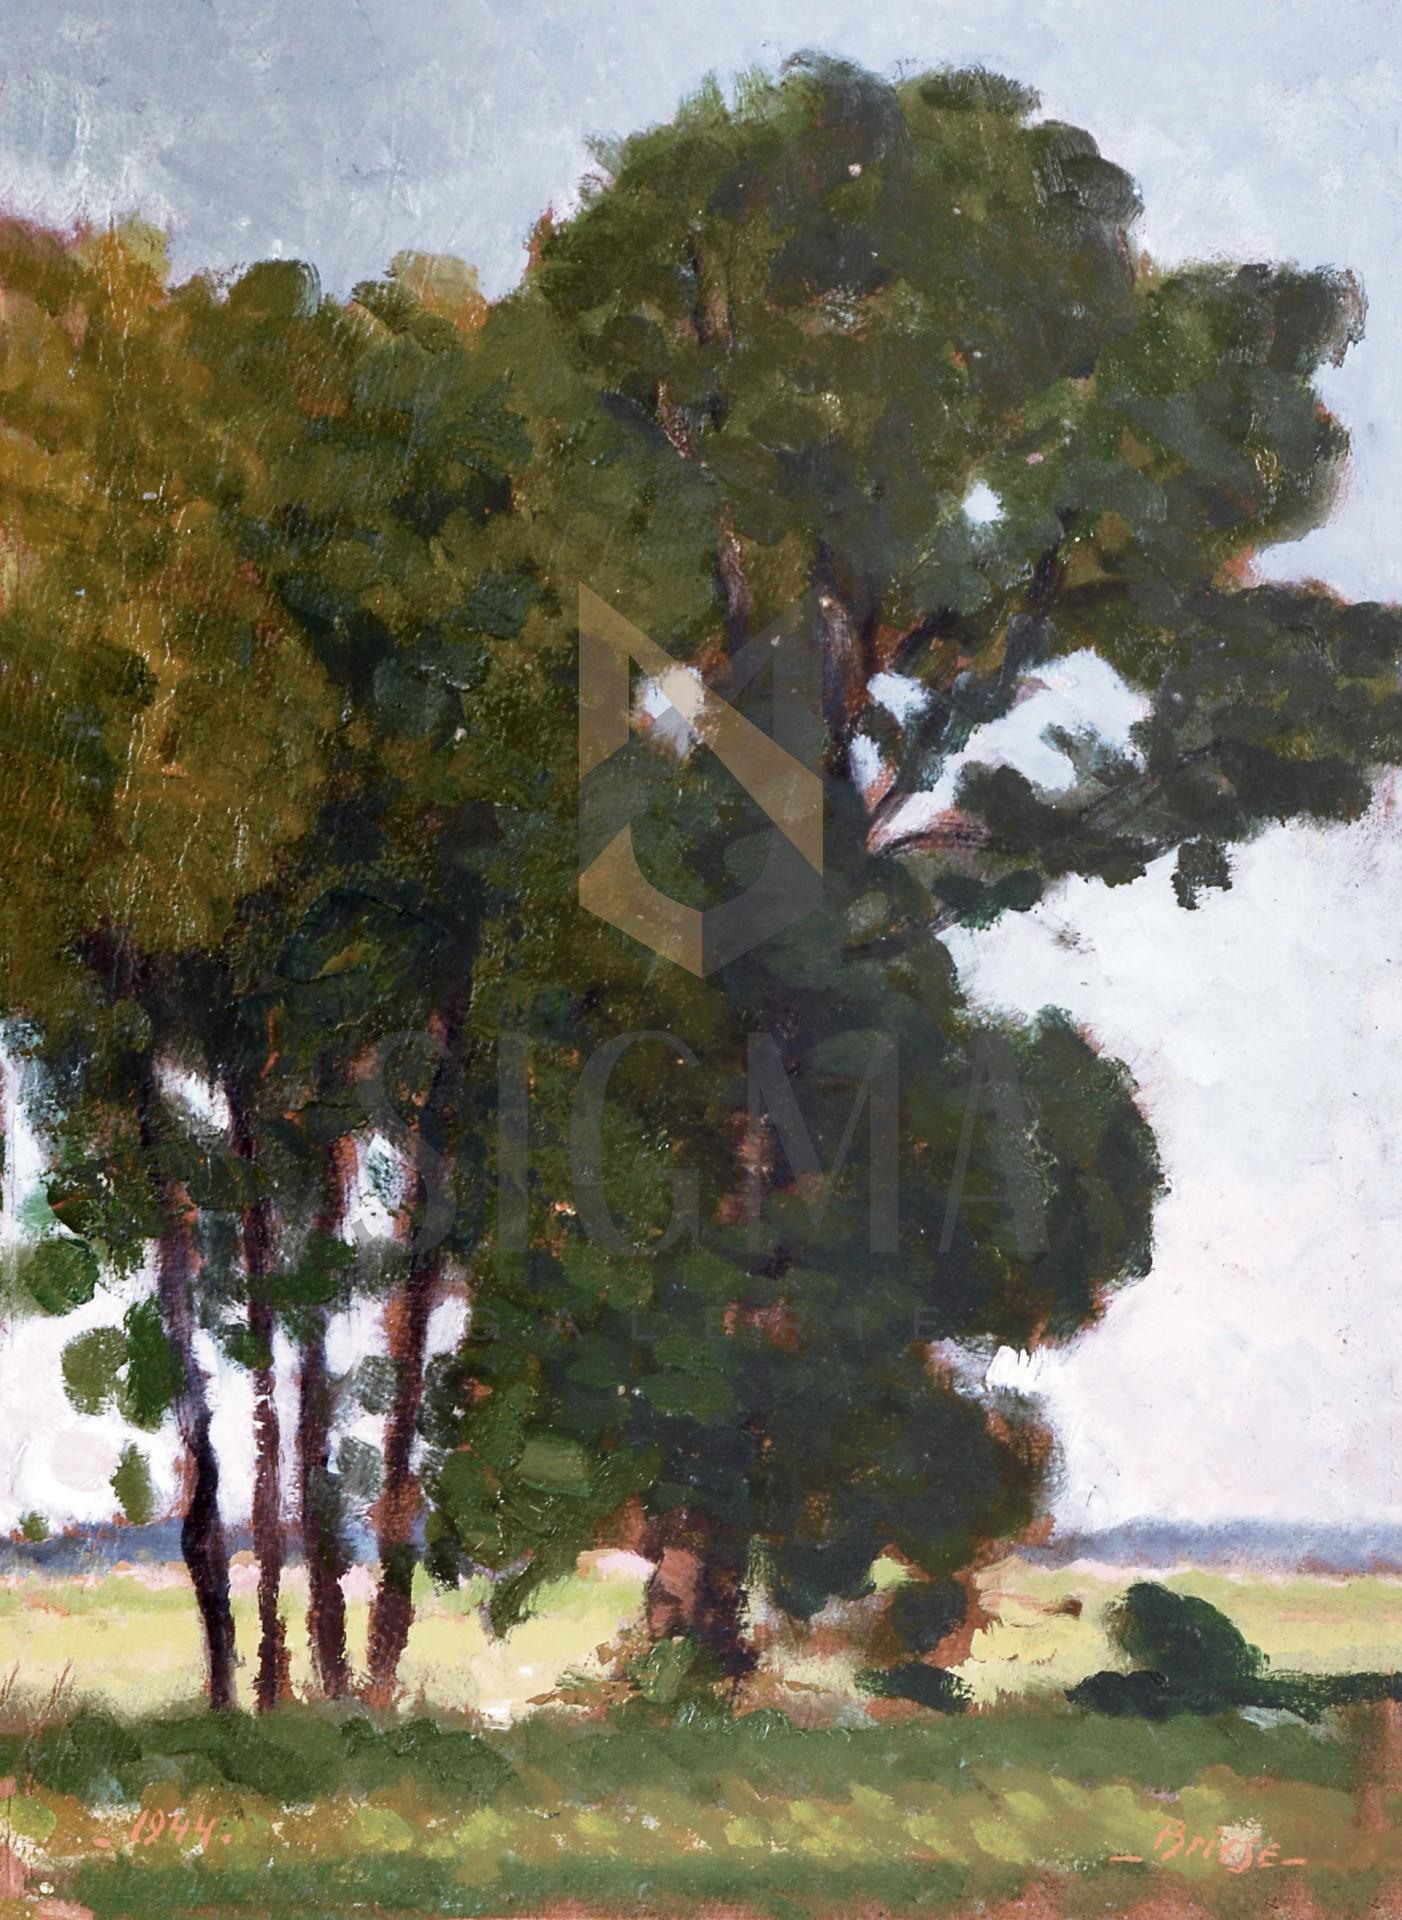 "Tablou OTTO BRIESE ""Copaci singuratici""  ulei pe carton, 42,5 x 32 cm datat 1944, semnat dreapta jos Briese"